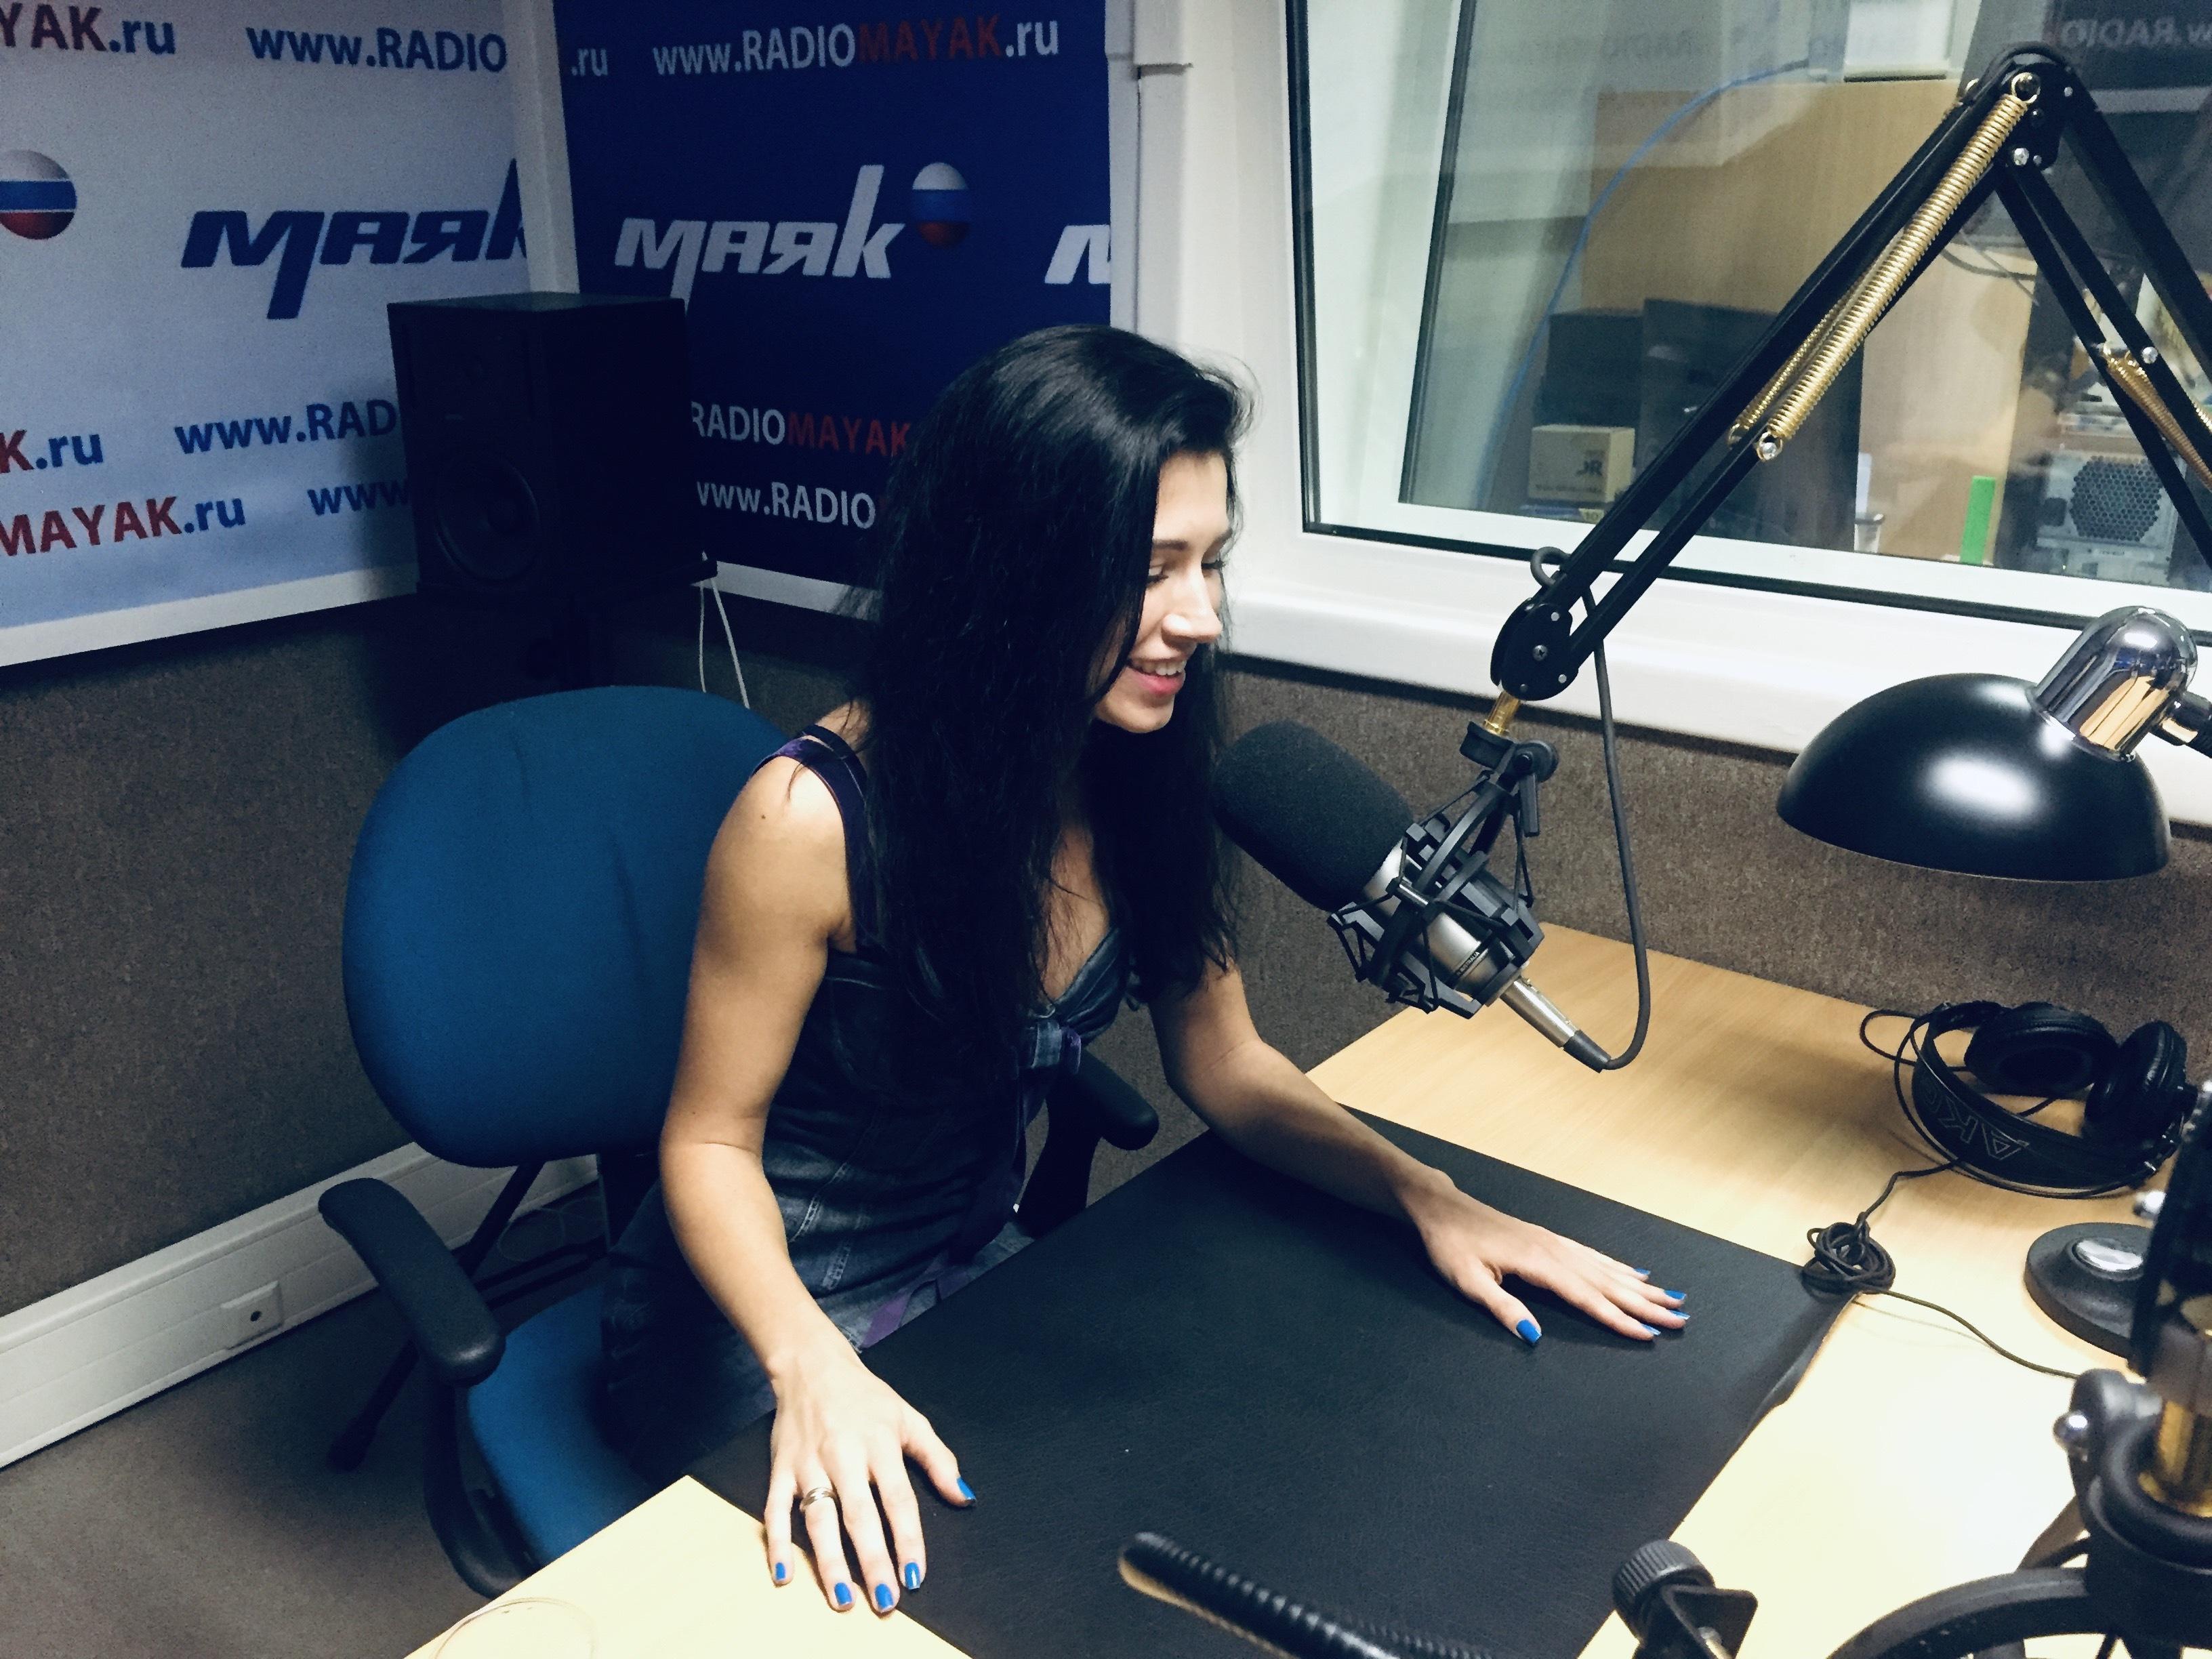 Валерия Репина на радио «Маяк» в передаче «Один Вадим»